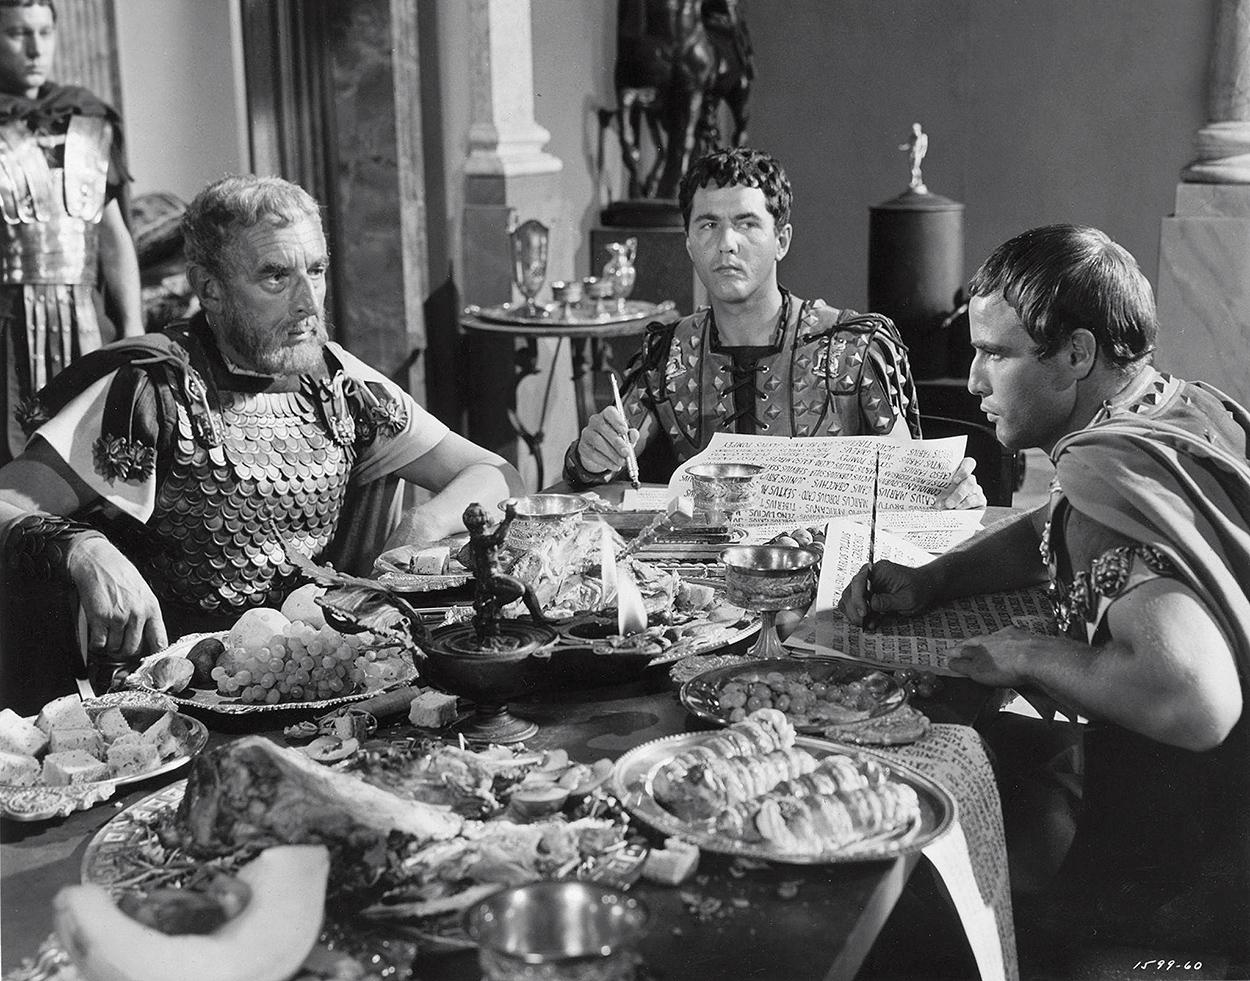 Julio César, de Joseph L. Mankiewicz